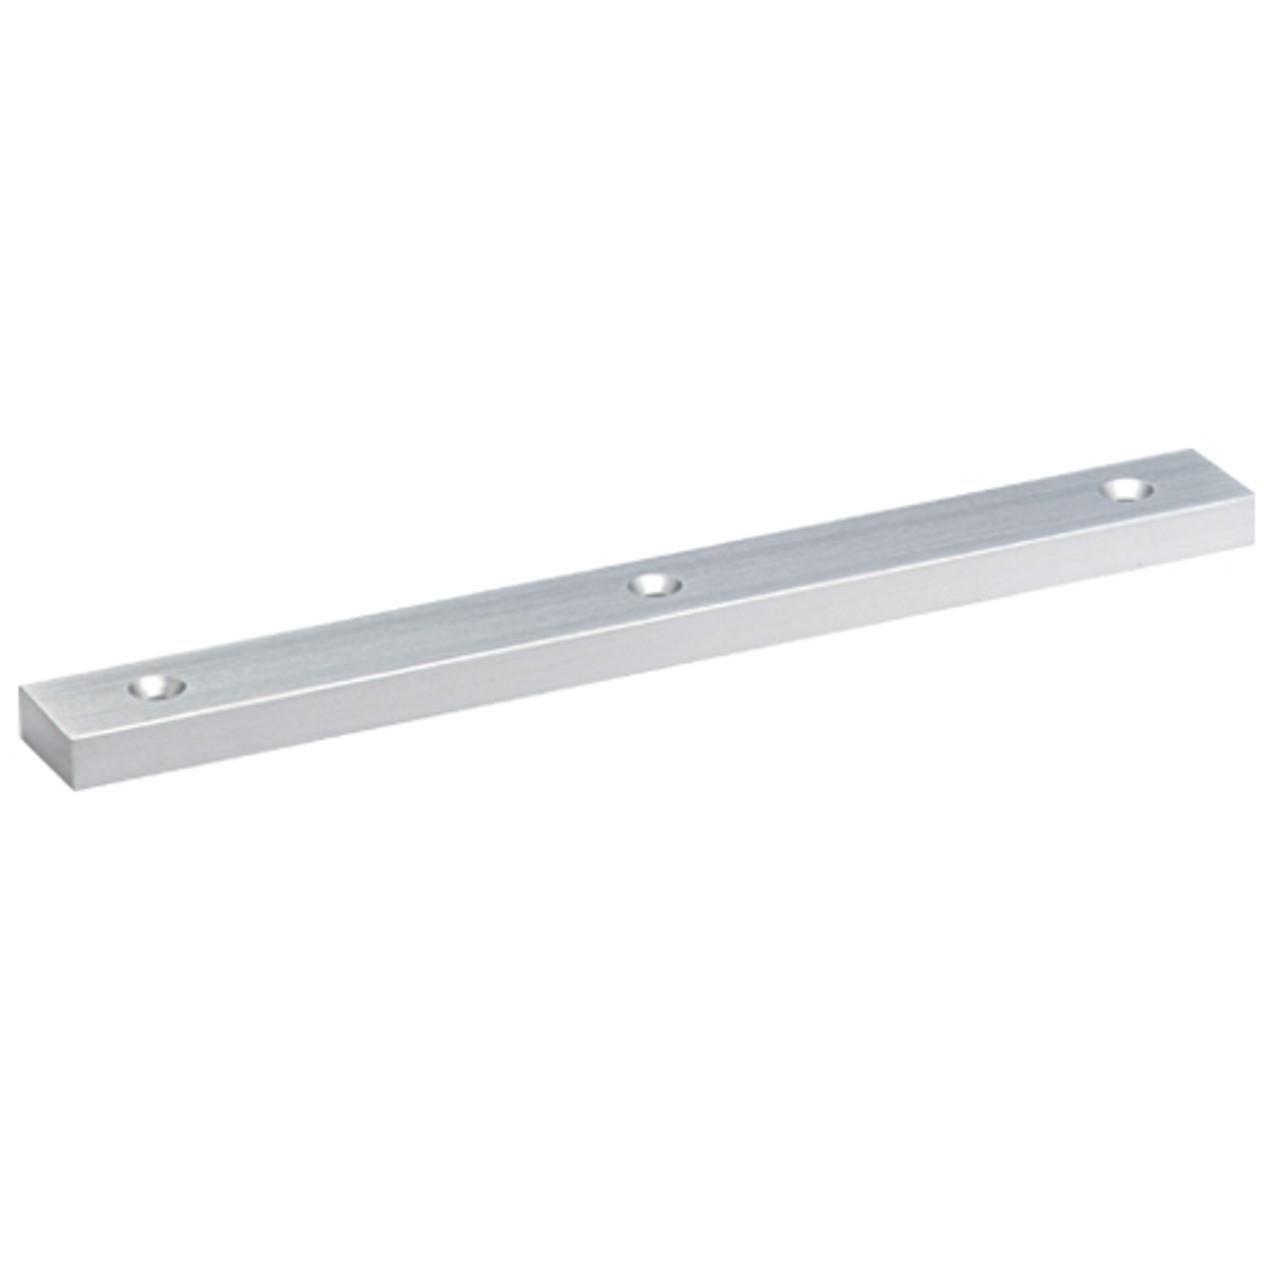 4314-US26 DynaLock 4000 Series Filler Plates for Single Maglocks in Bright Chrome